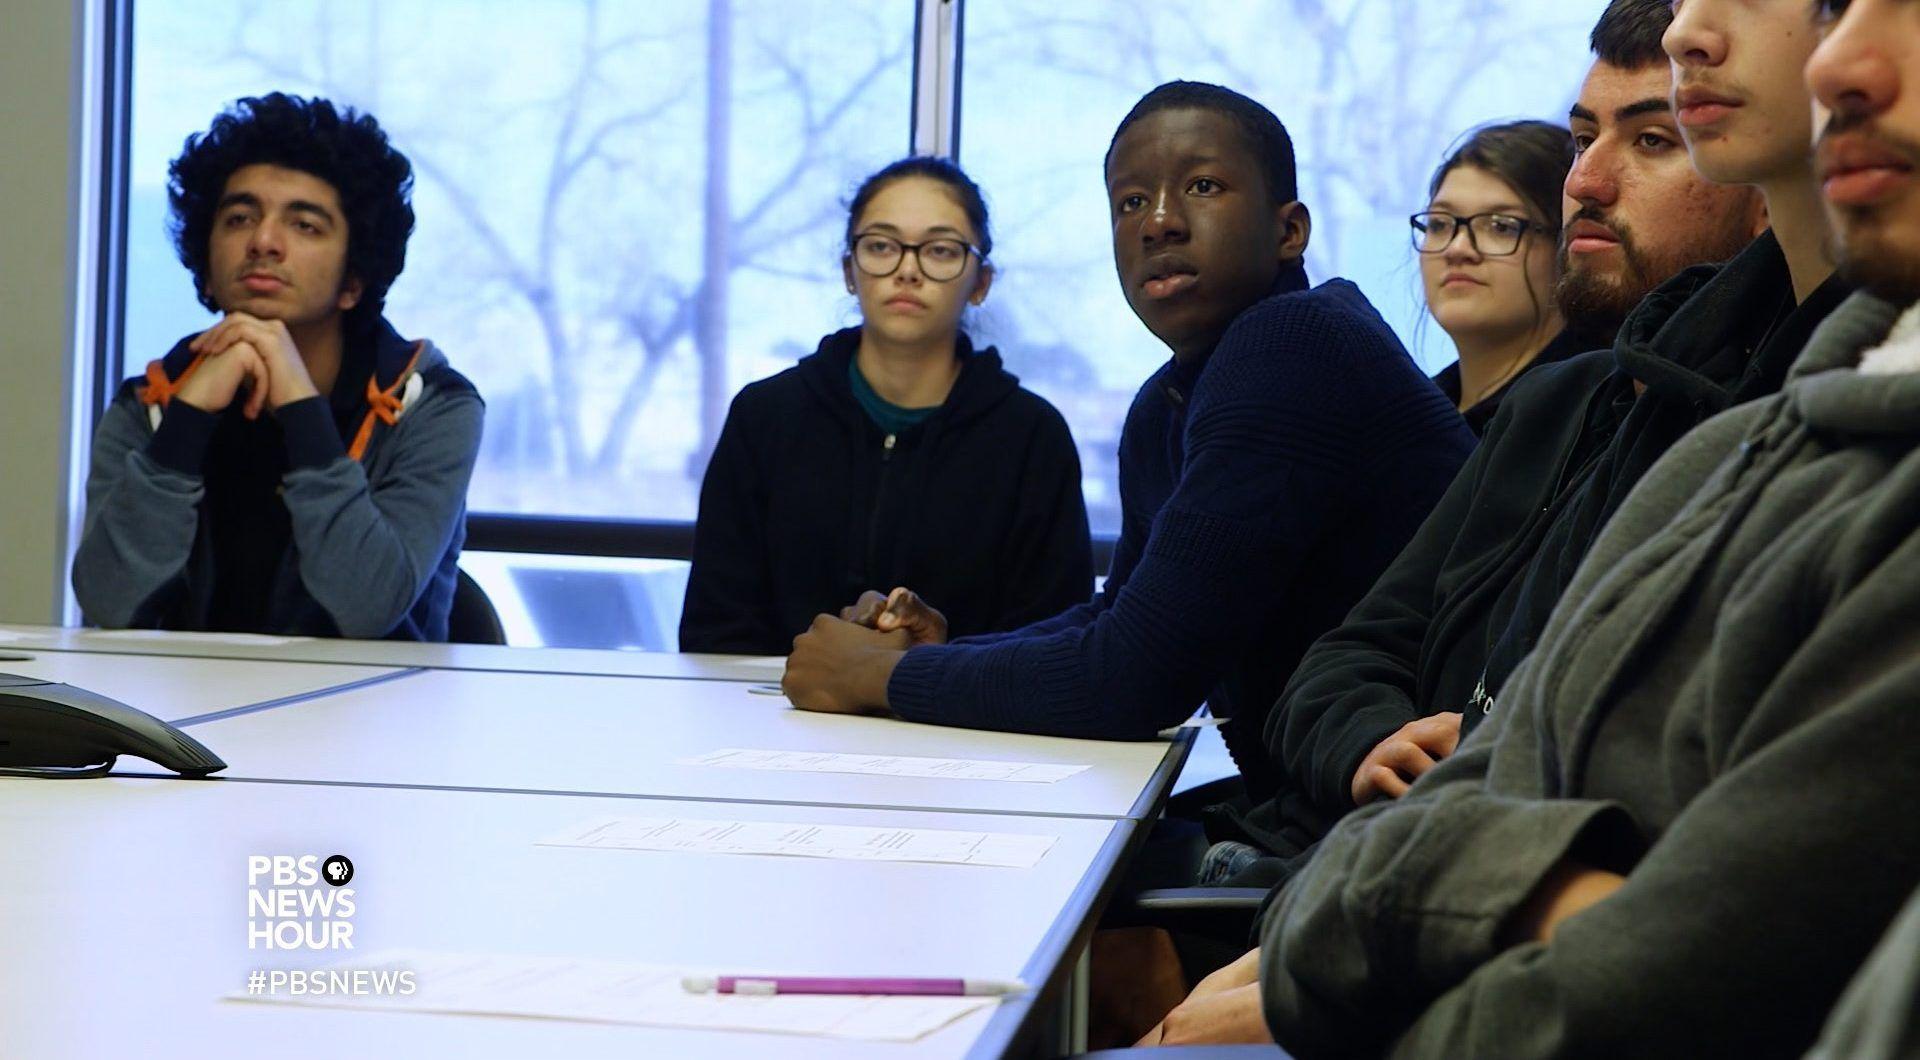 Colorado apprenticeship program turns the factory floor